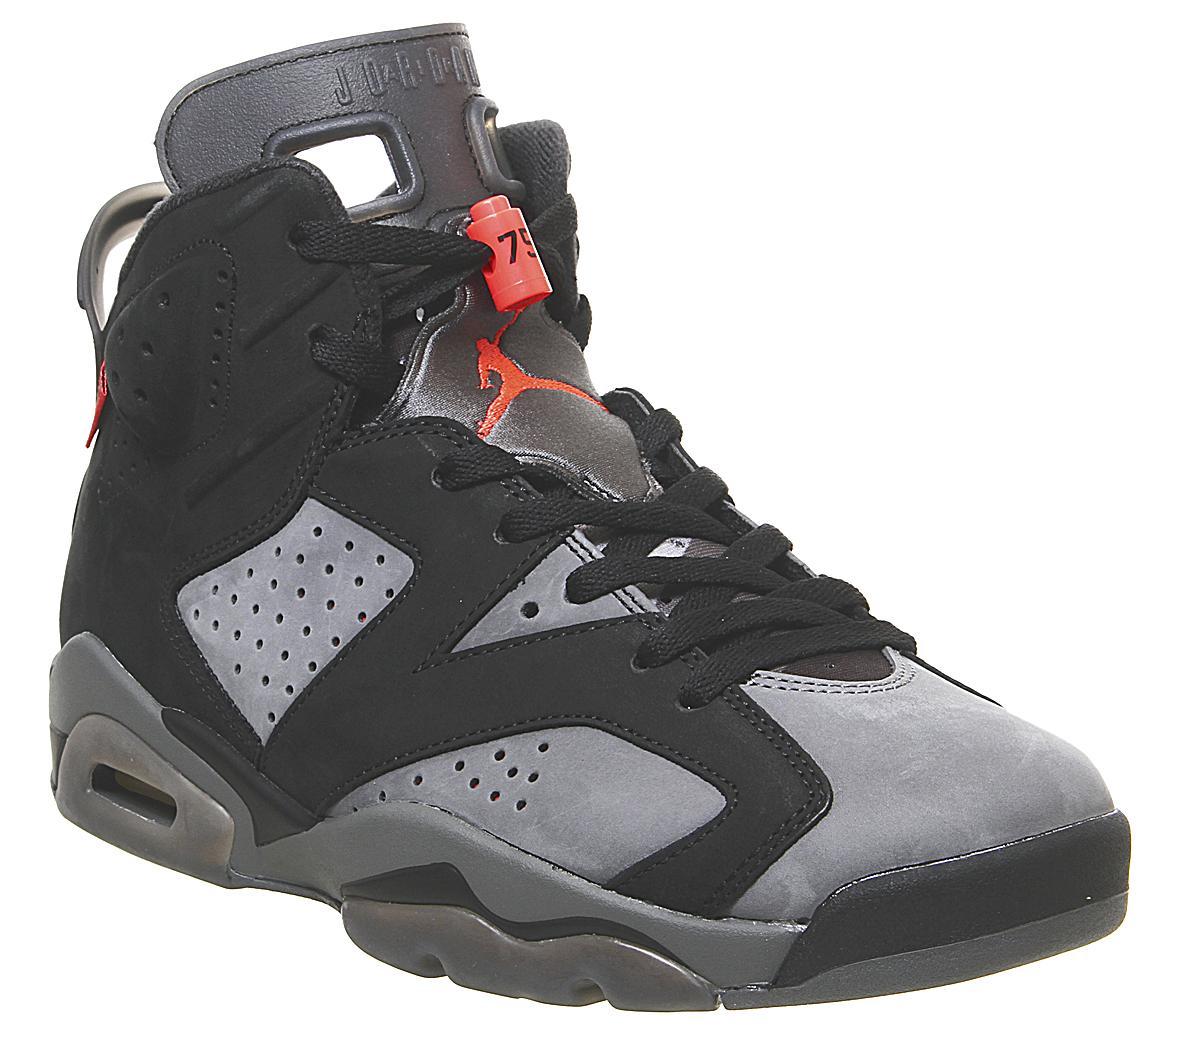 Jordan Air Jordan 6 Trainers Psg Iron